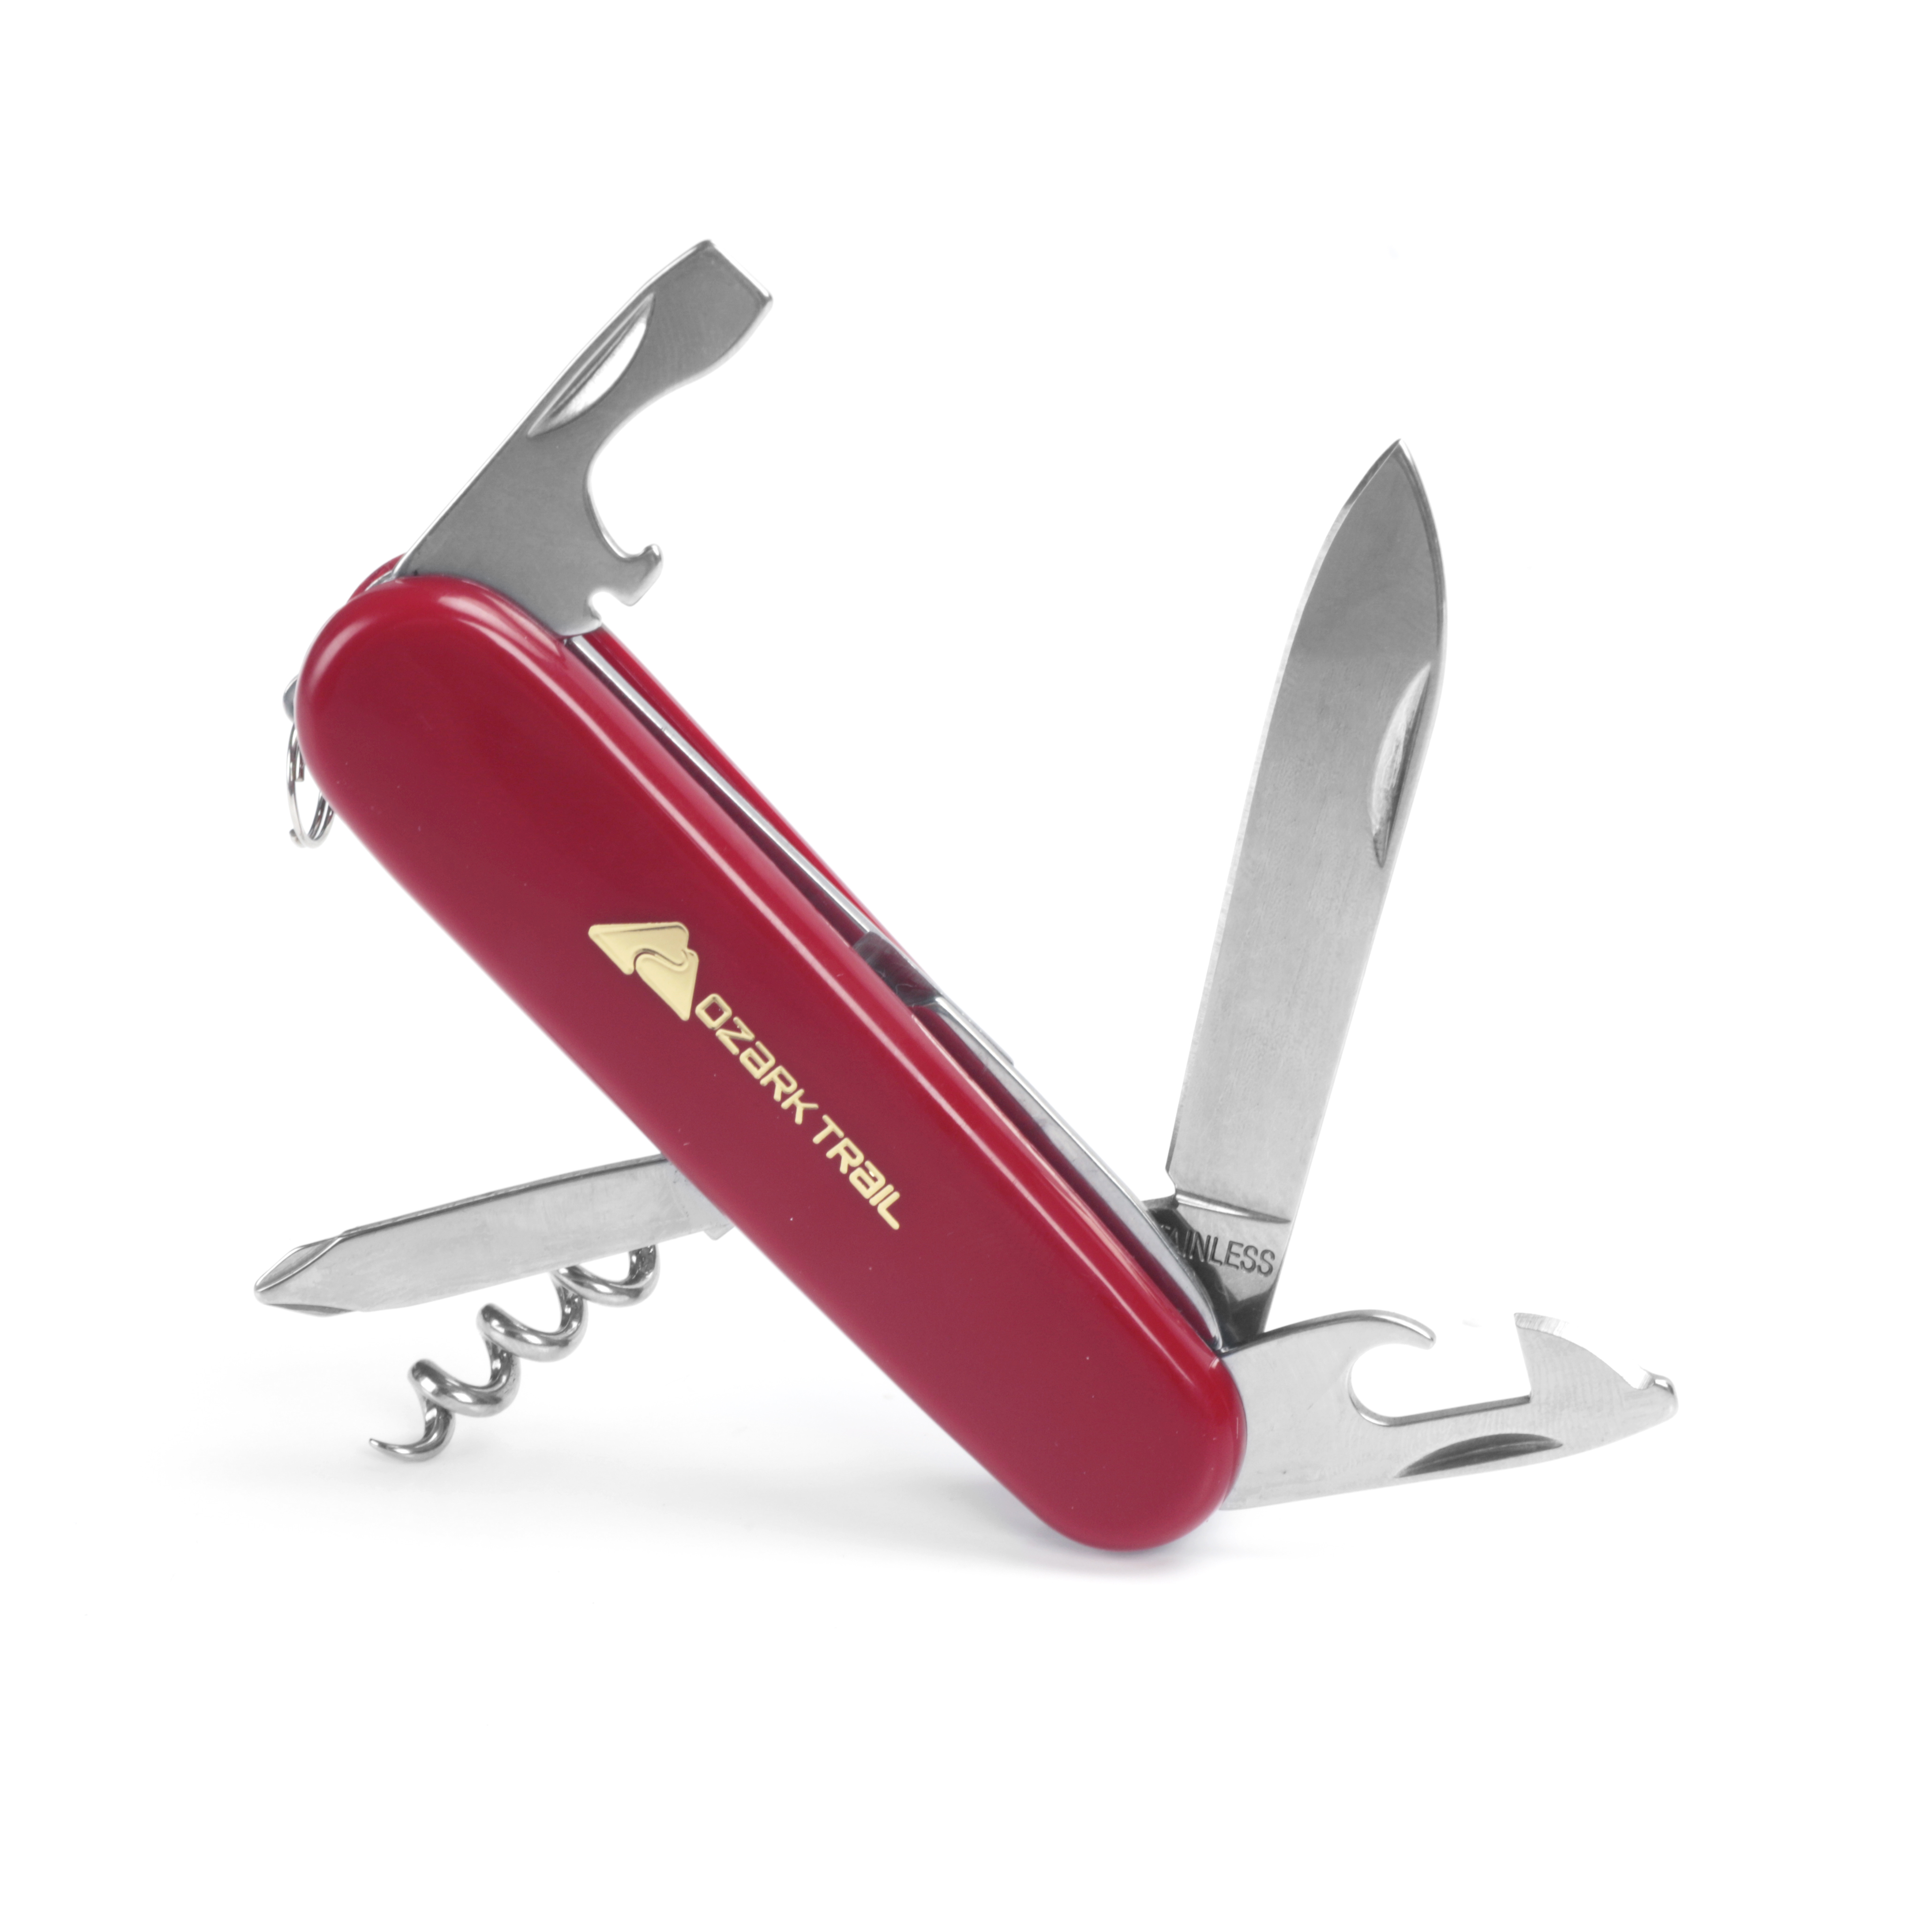 Ozark Trail Ot Knife Multi Tool 8 Function